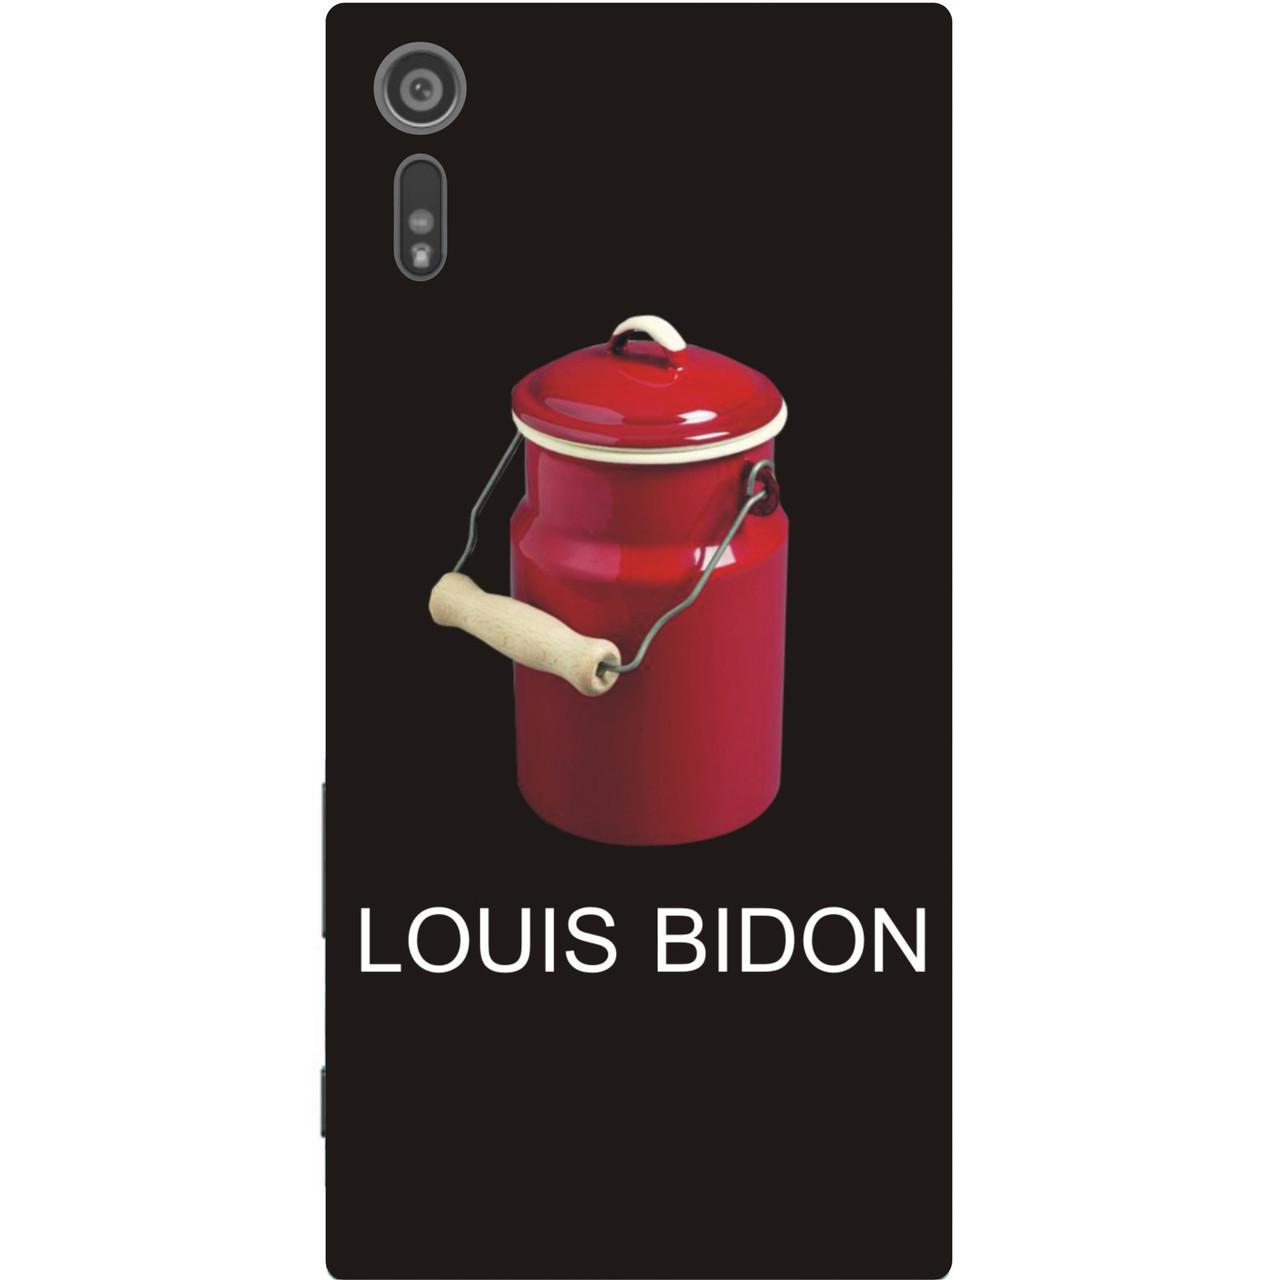 Антибрендовый силиконовый чехол для Sony Xperia XZ f8332 с картинкой Louis Bidon